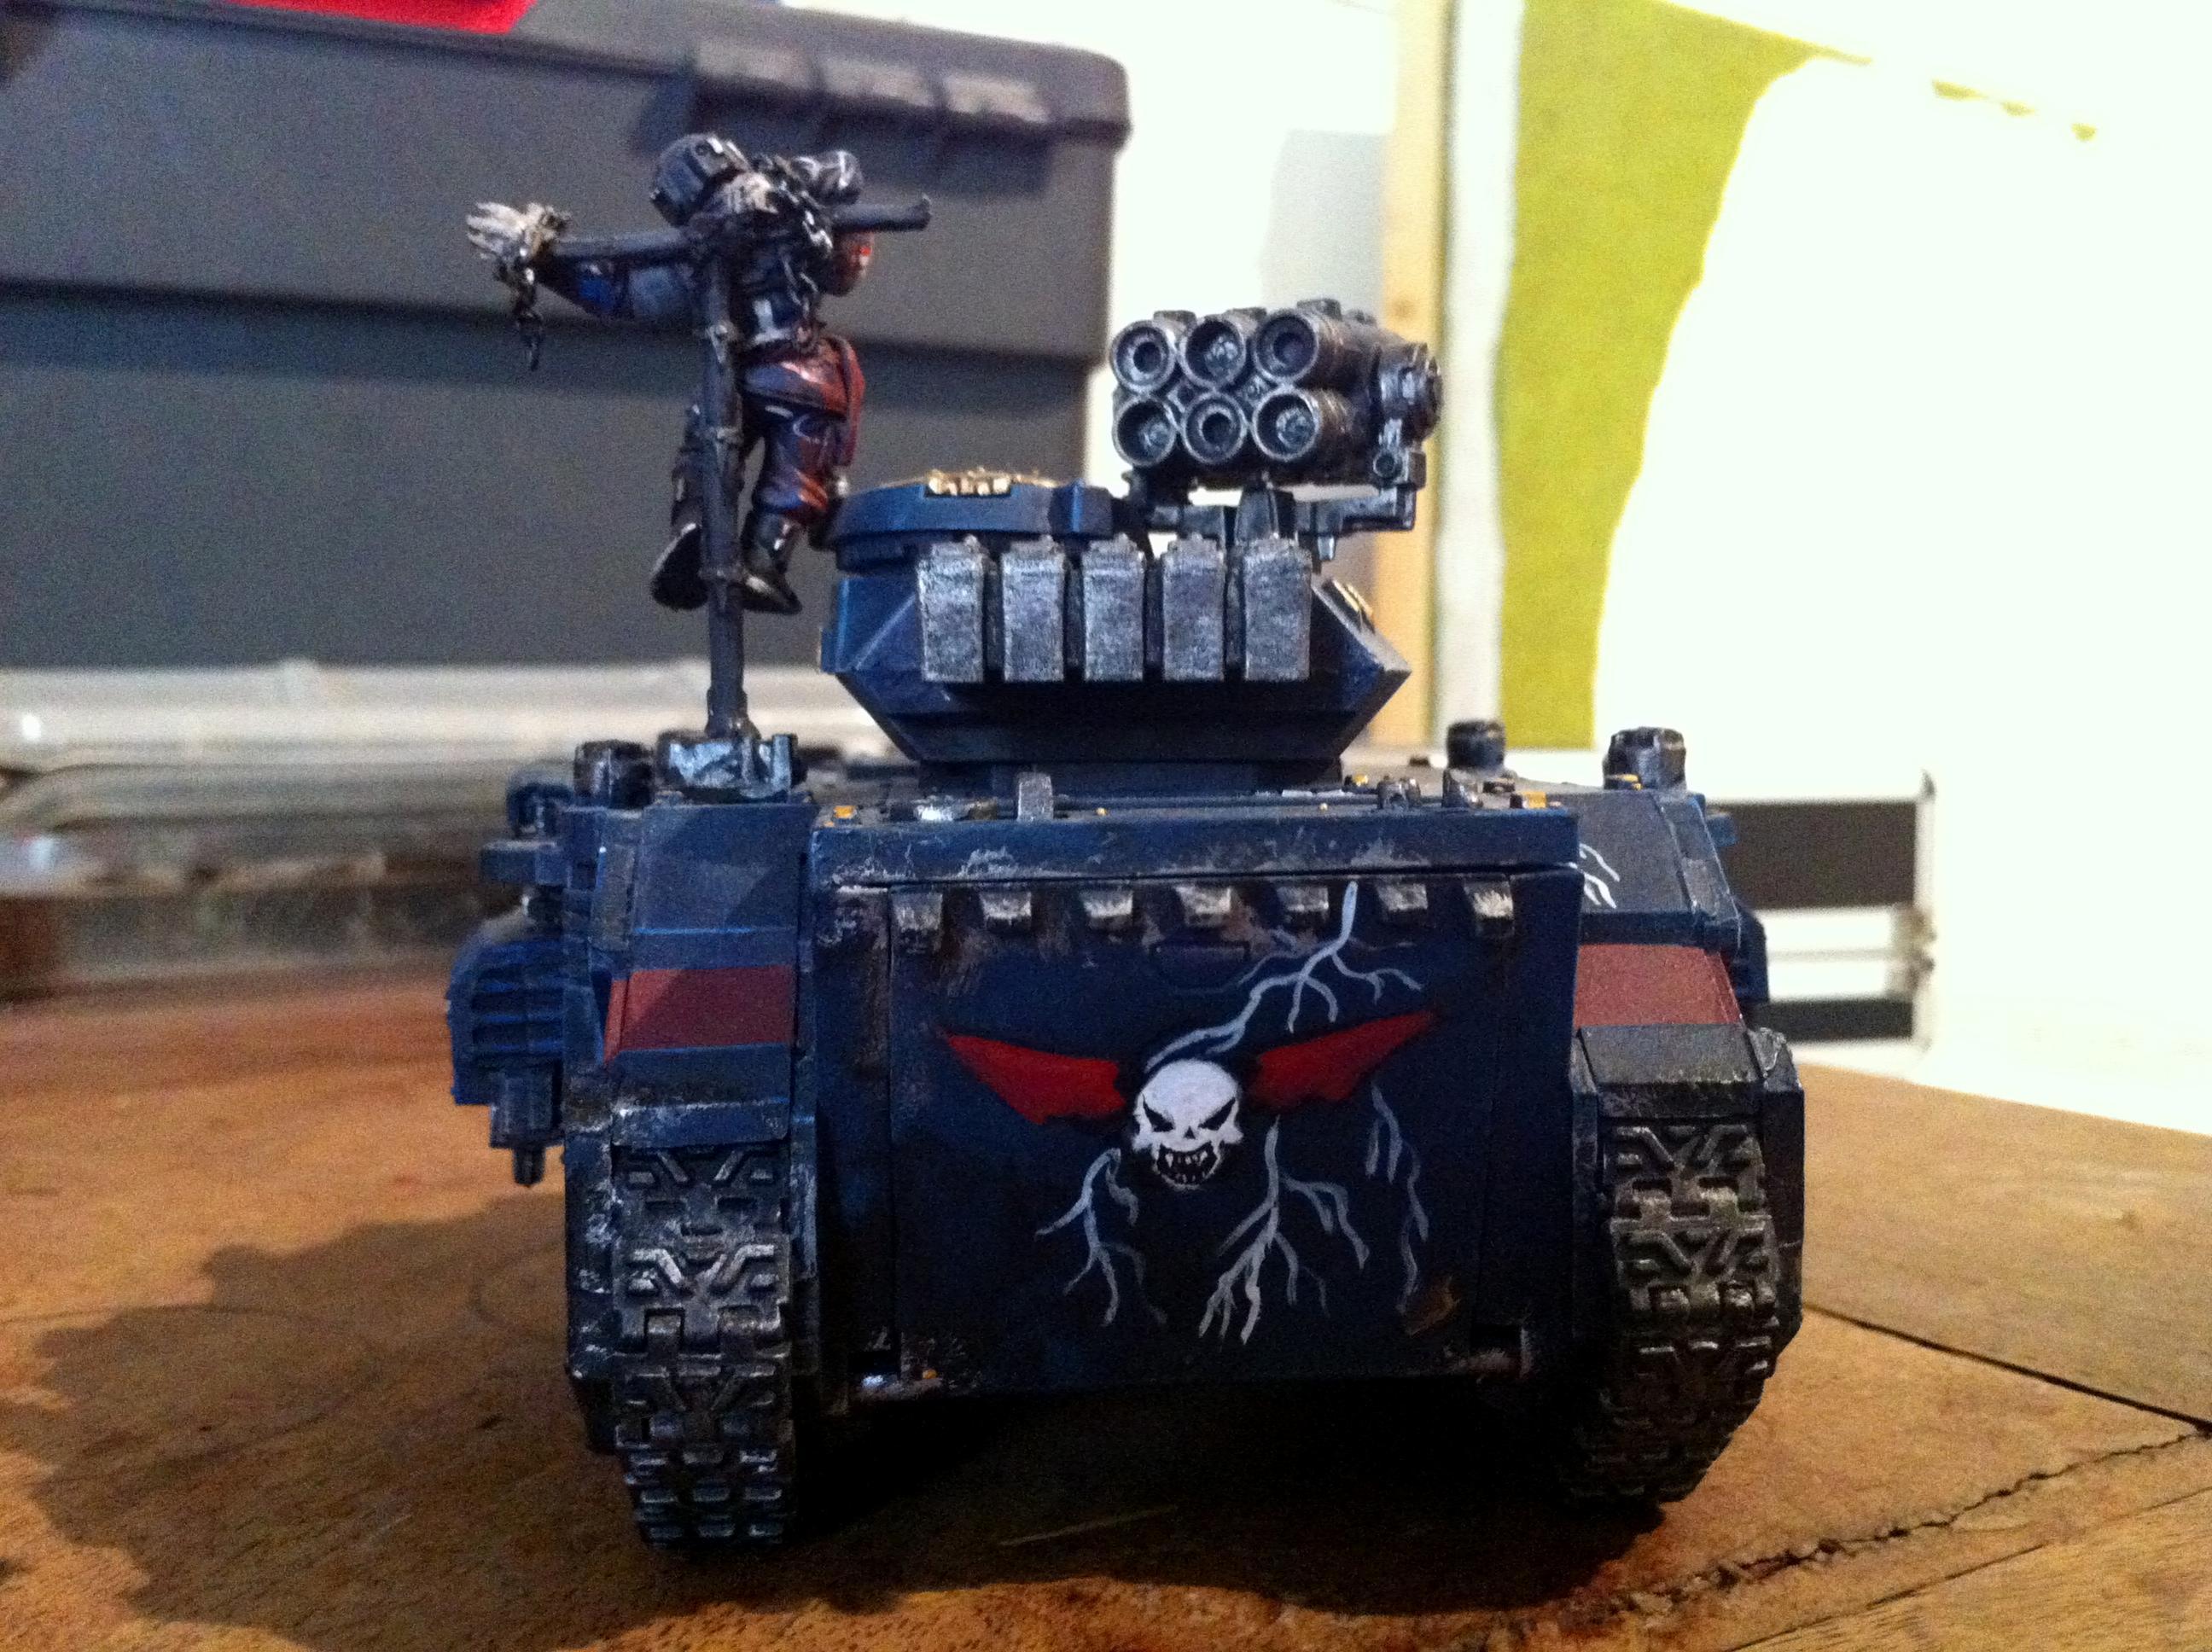 Chaos Space Marines, Nightlords, Predator, Tank, Warhammer 40,000